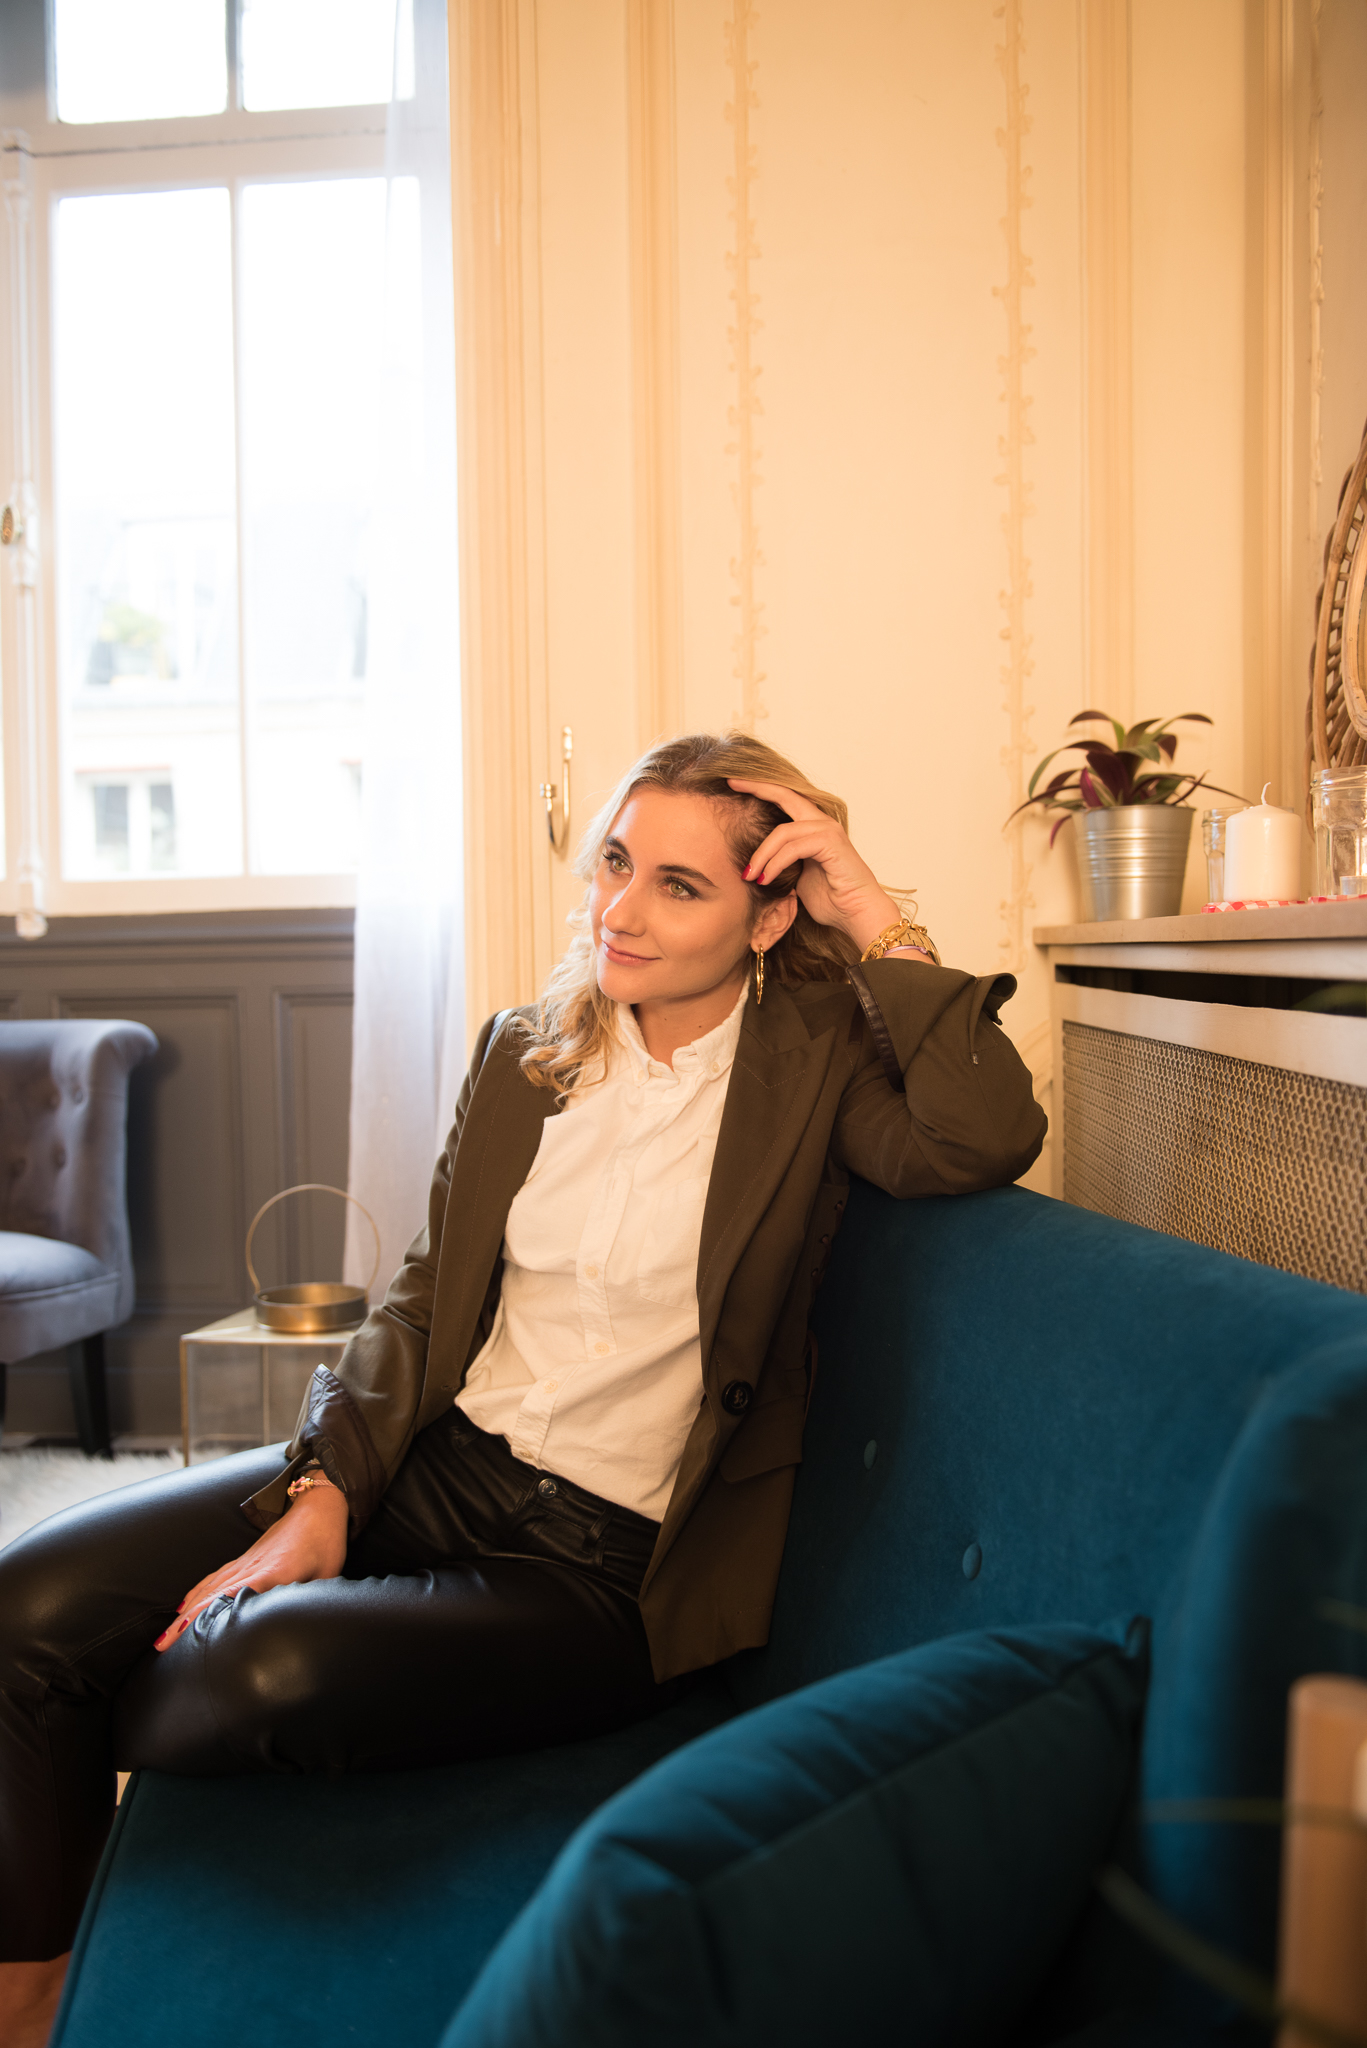 Bonne Maman, blog mode, camille benaroche, blog beauté, lifestyle, travels, mode, streetstyle, blog mode paris